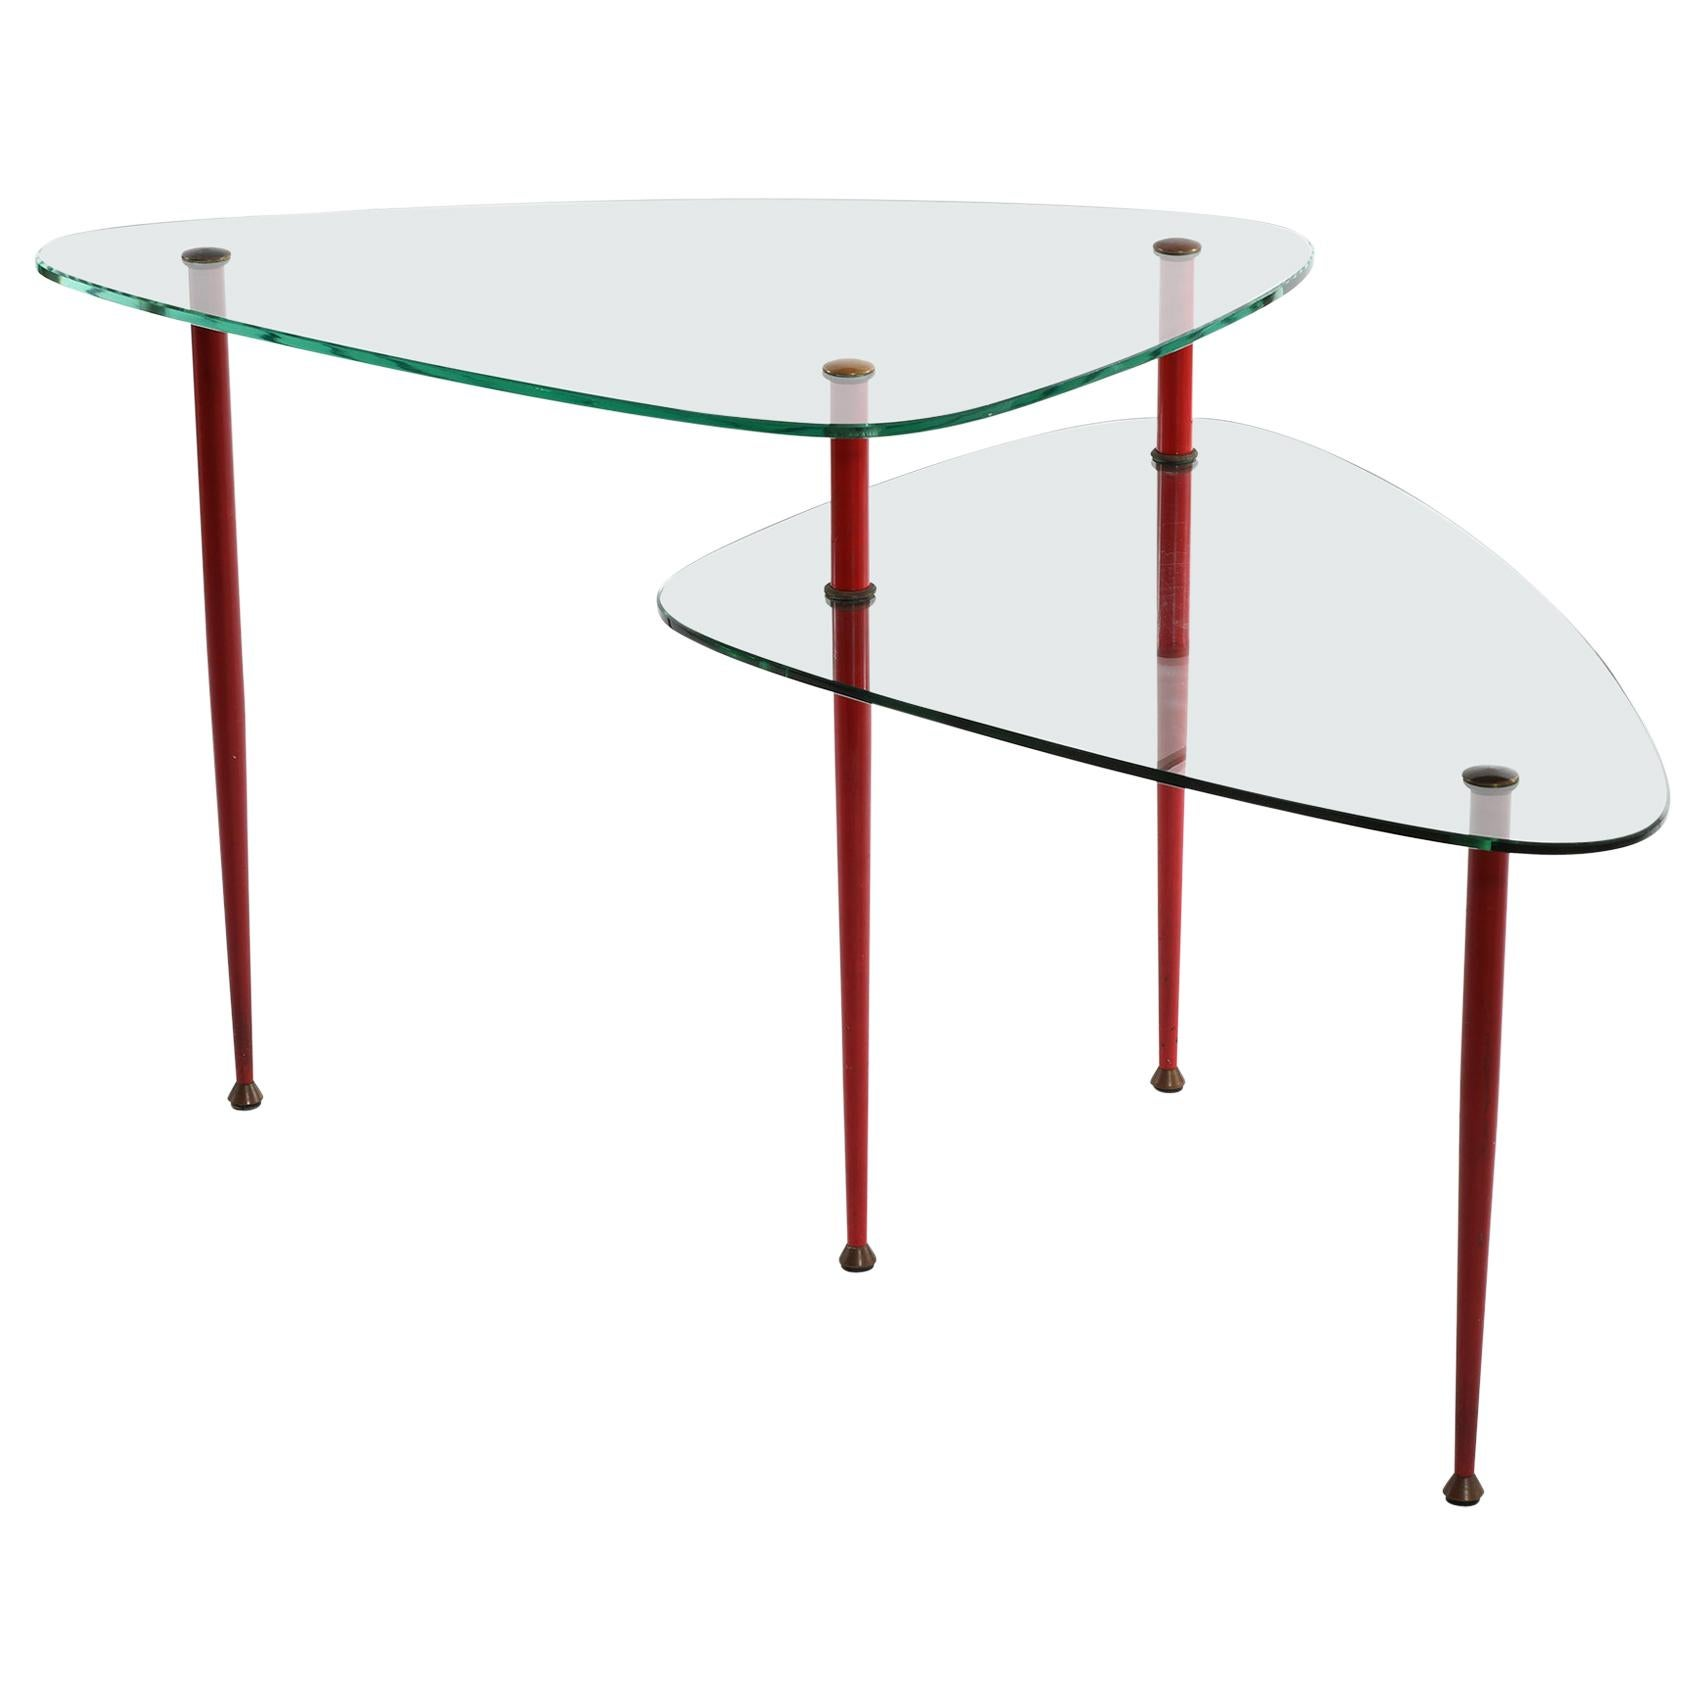 Edoardo Paoli Midcentury Italian Tempered Glass and Brass Side Table